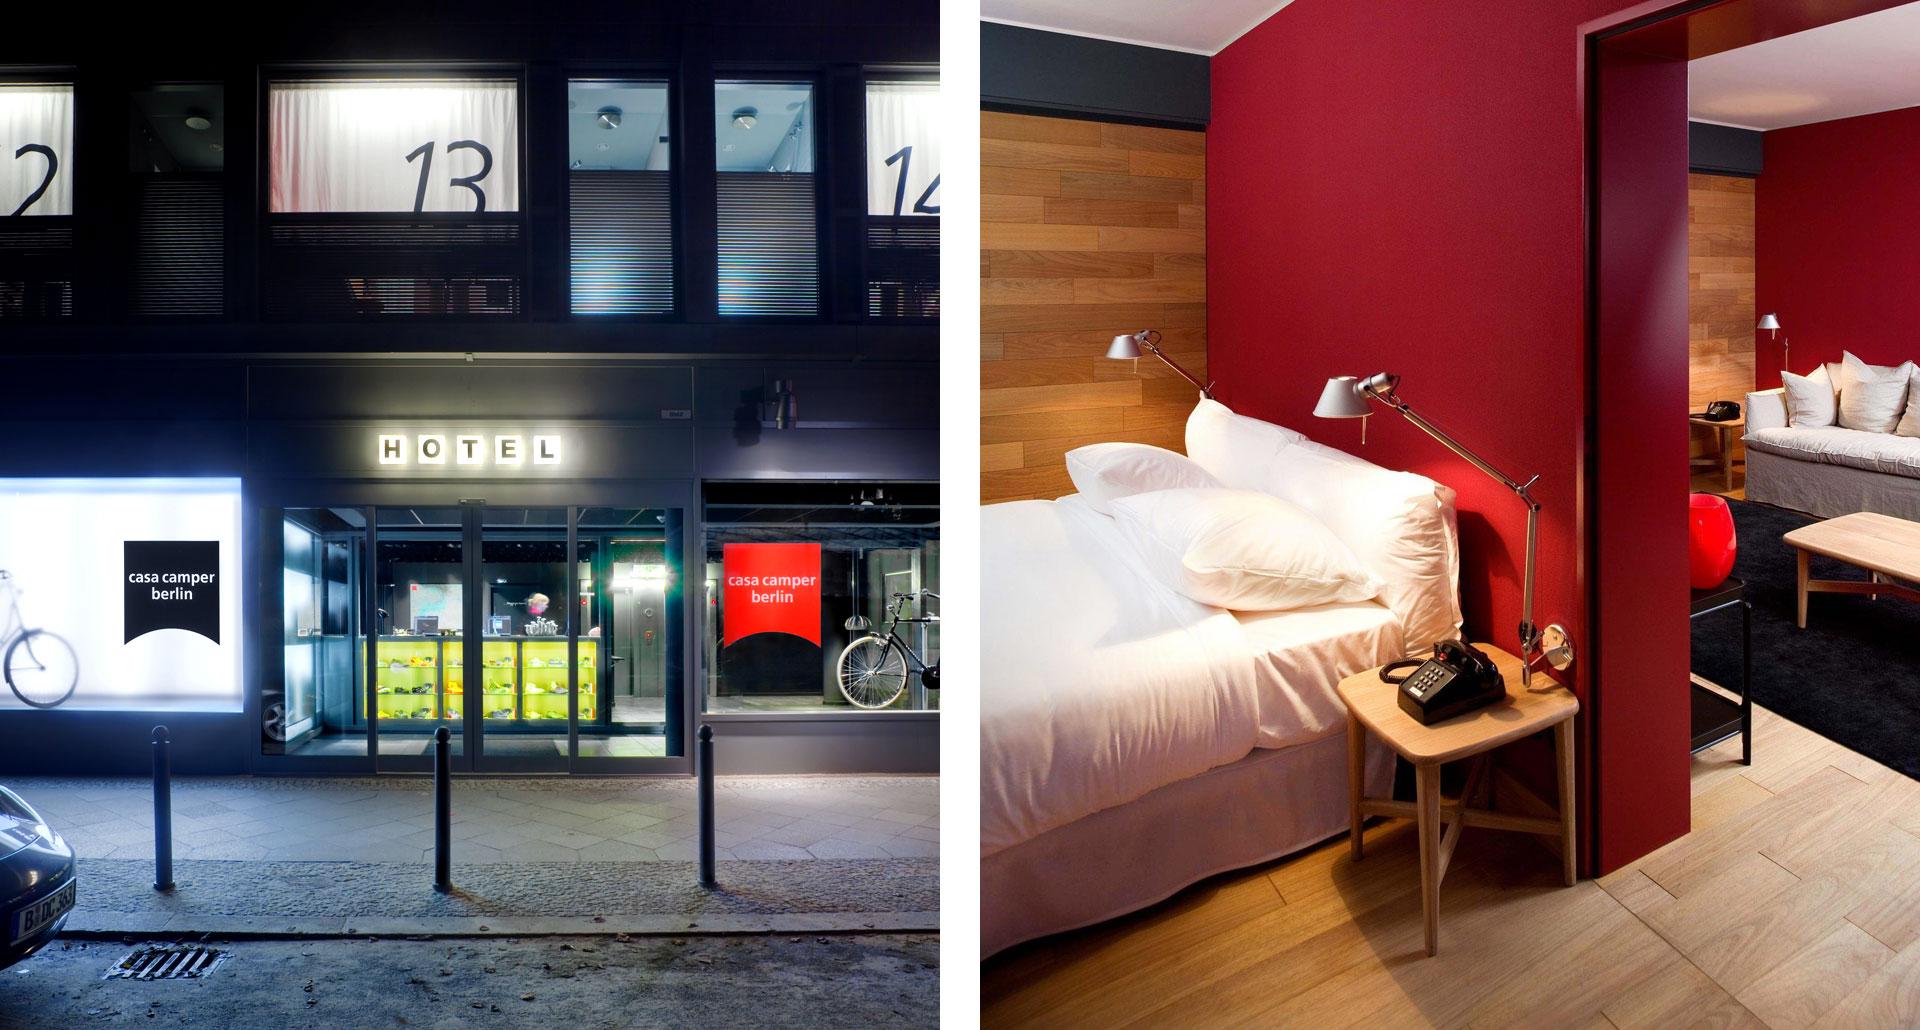 Casa Camper Berlin - boutique hotel in Berlino